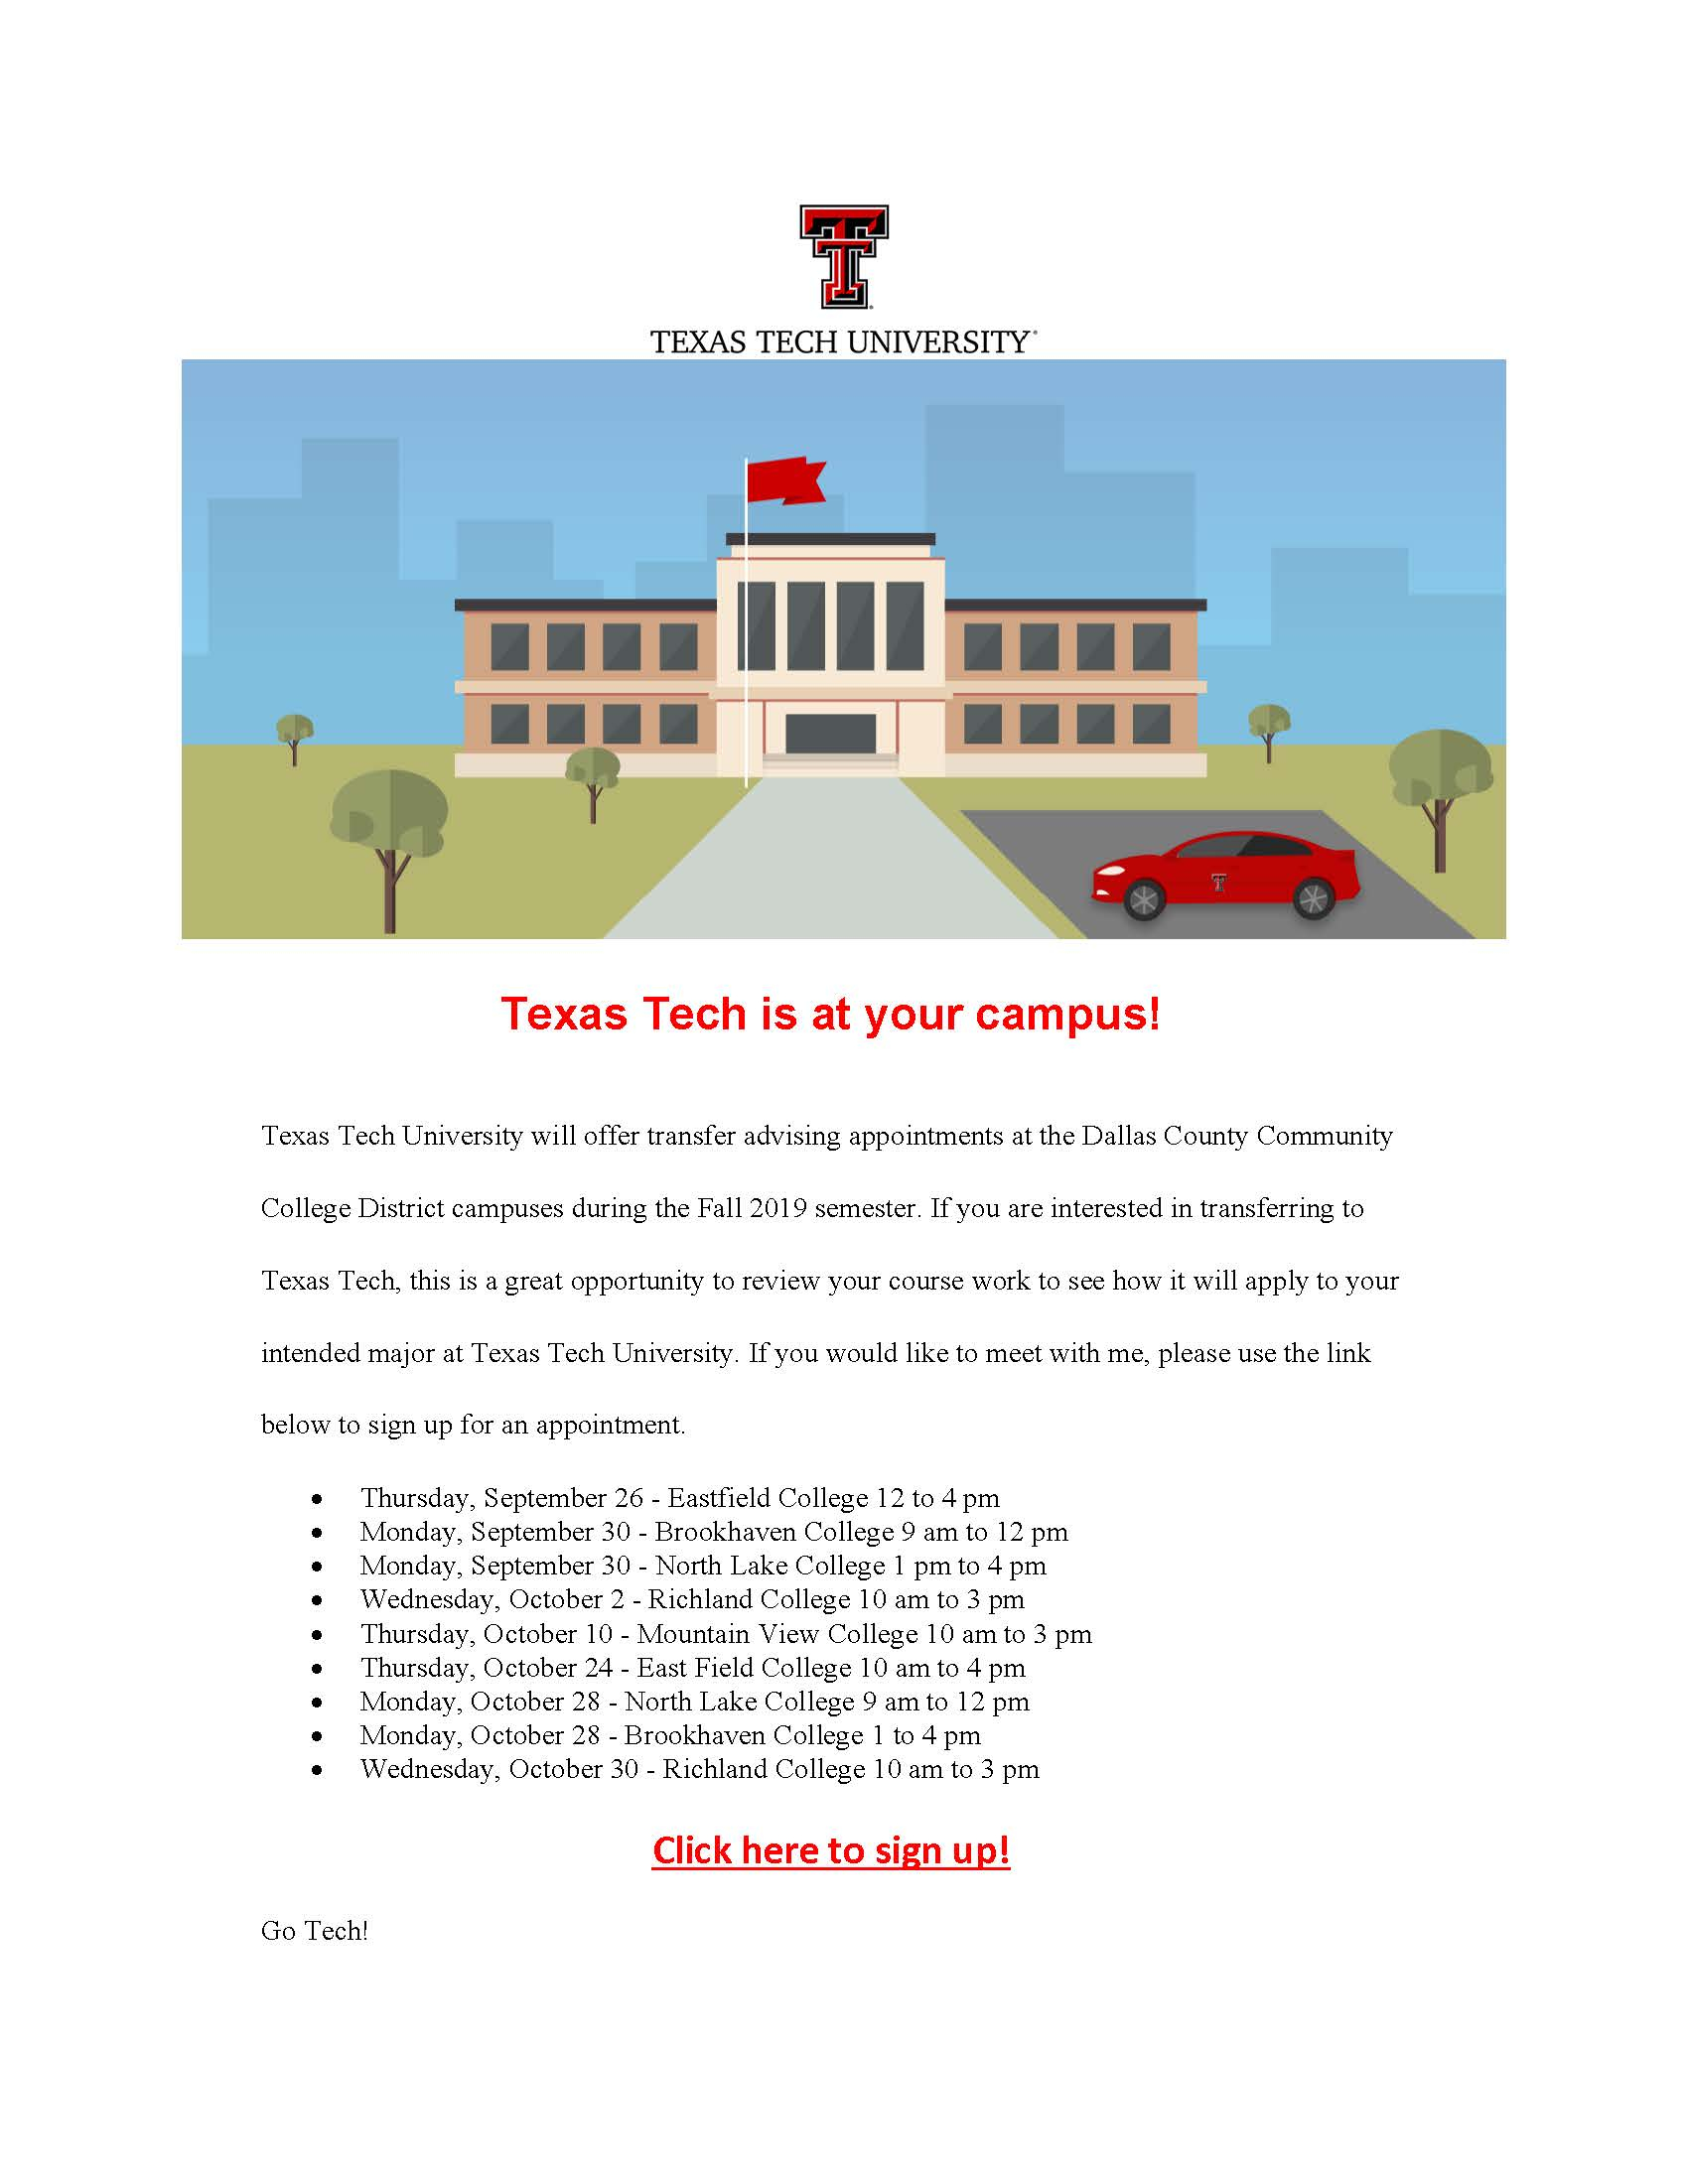 Brookhaven Campus – University Visit: Texas Tech Student Throughout Texas Tech University Semester Schedule